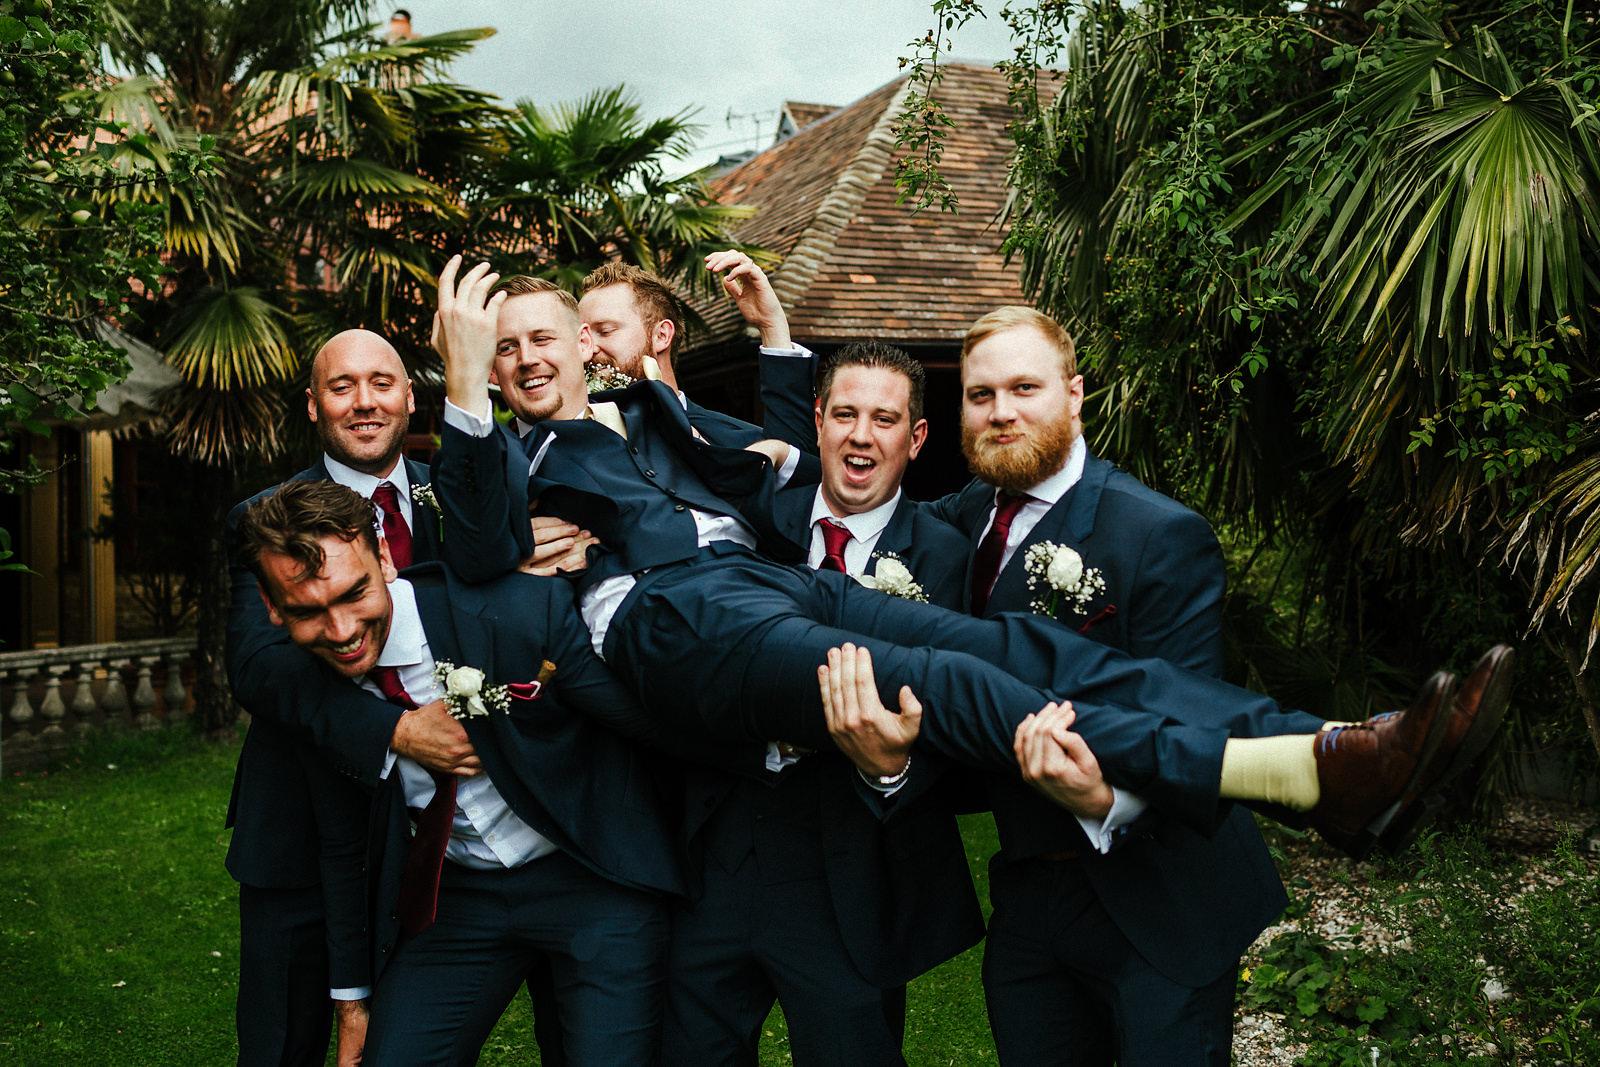 Best Crazy Bear wedding photos in Stadhampton